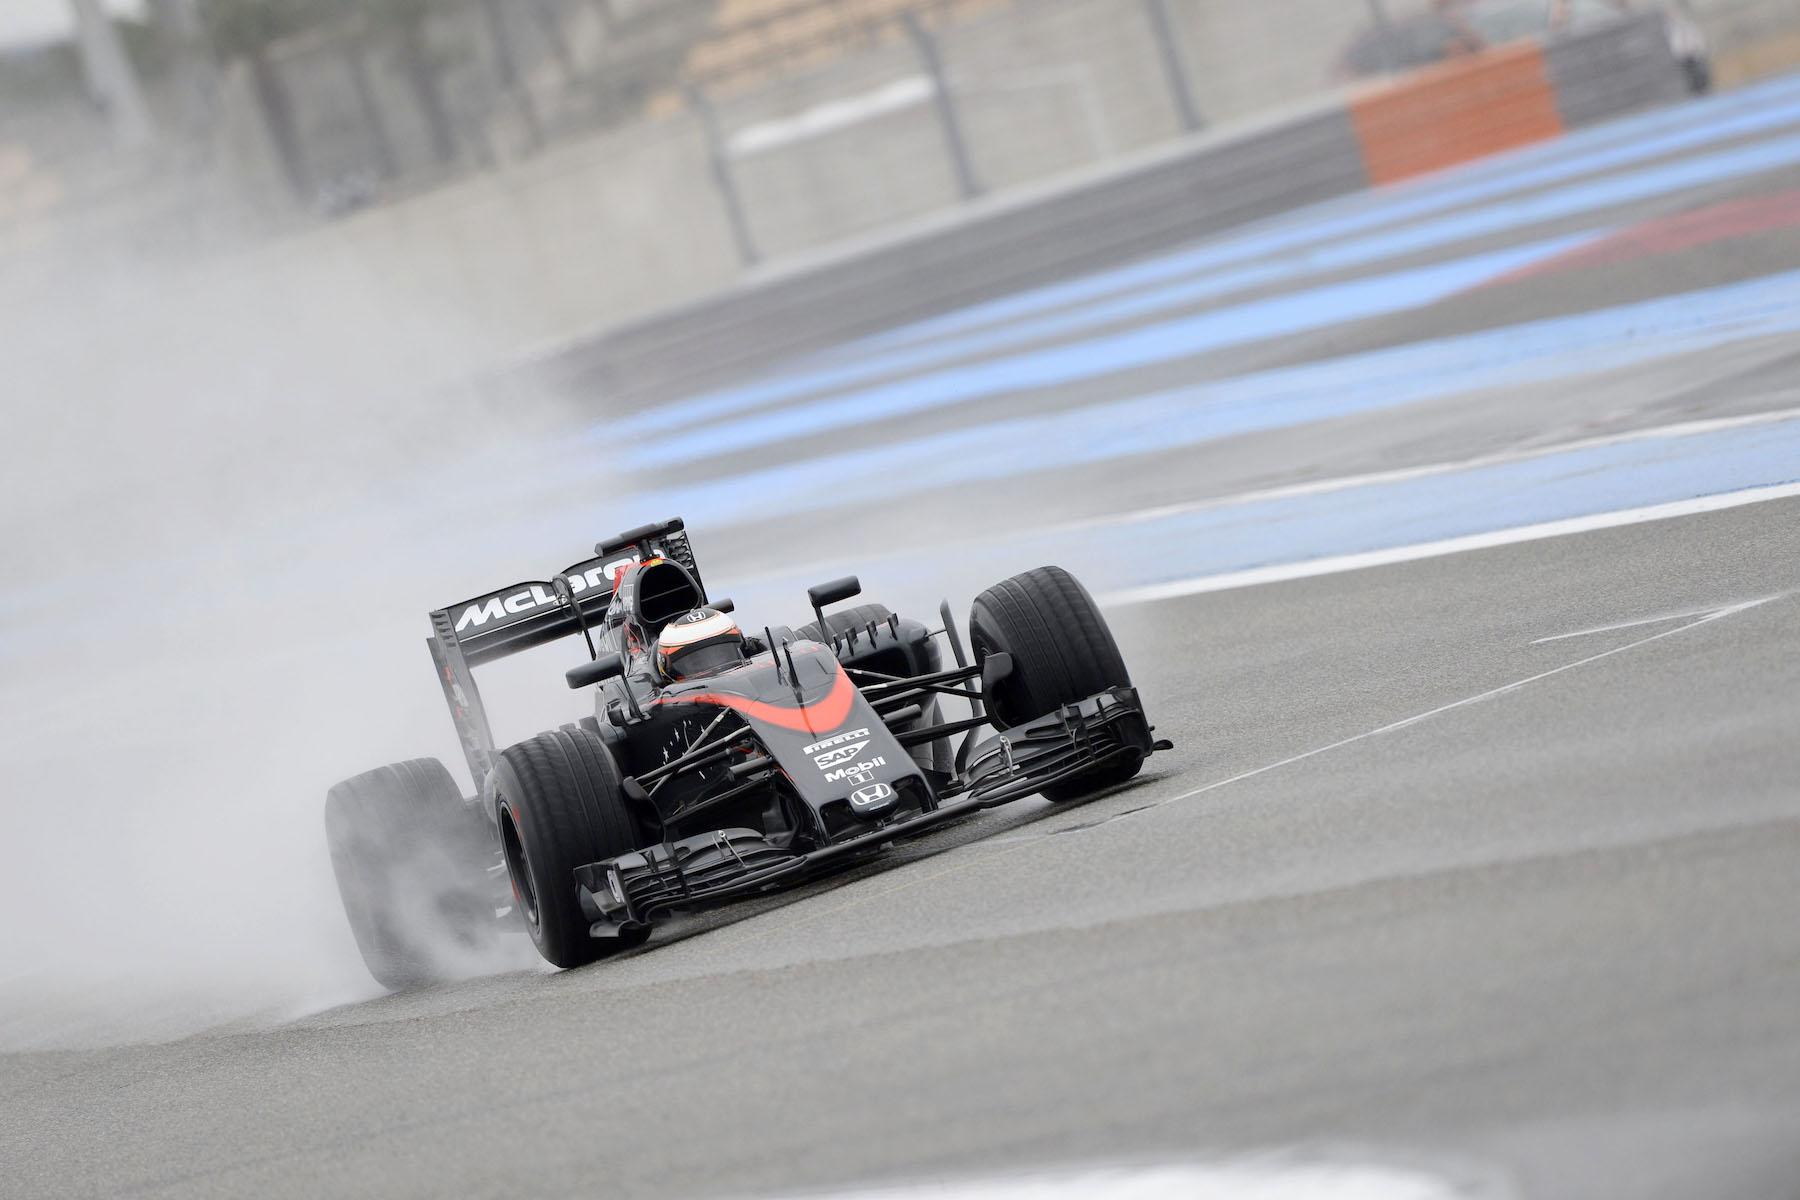 Stoffel Vandoorne during Pirelli's wet tire tests in France